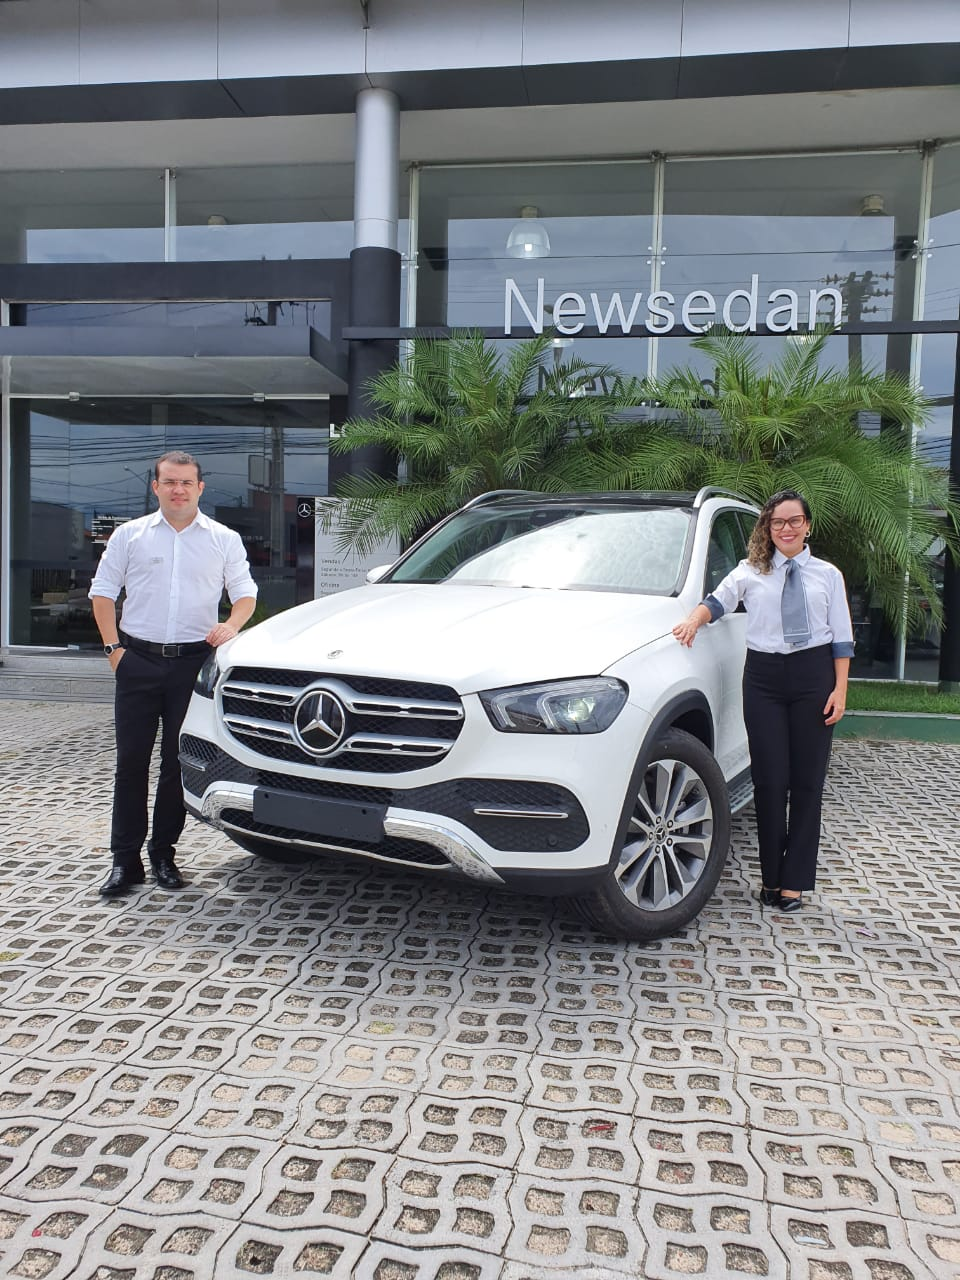 Newsedan Mercedes-Benz pronta para mostrar o Novo GLE, o SUV de luxo